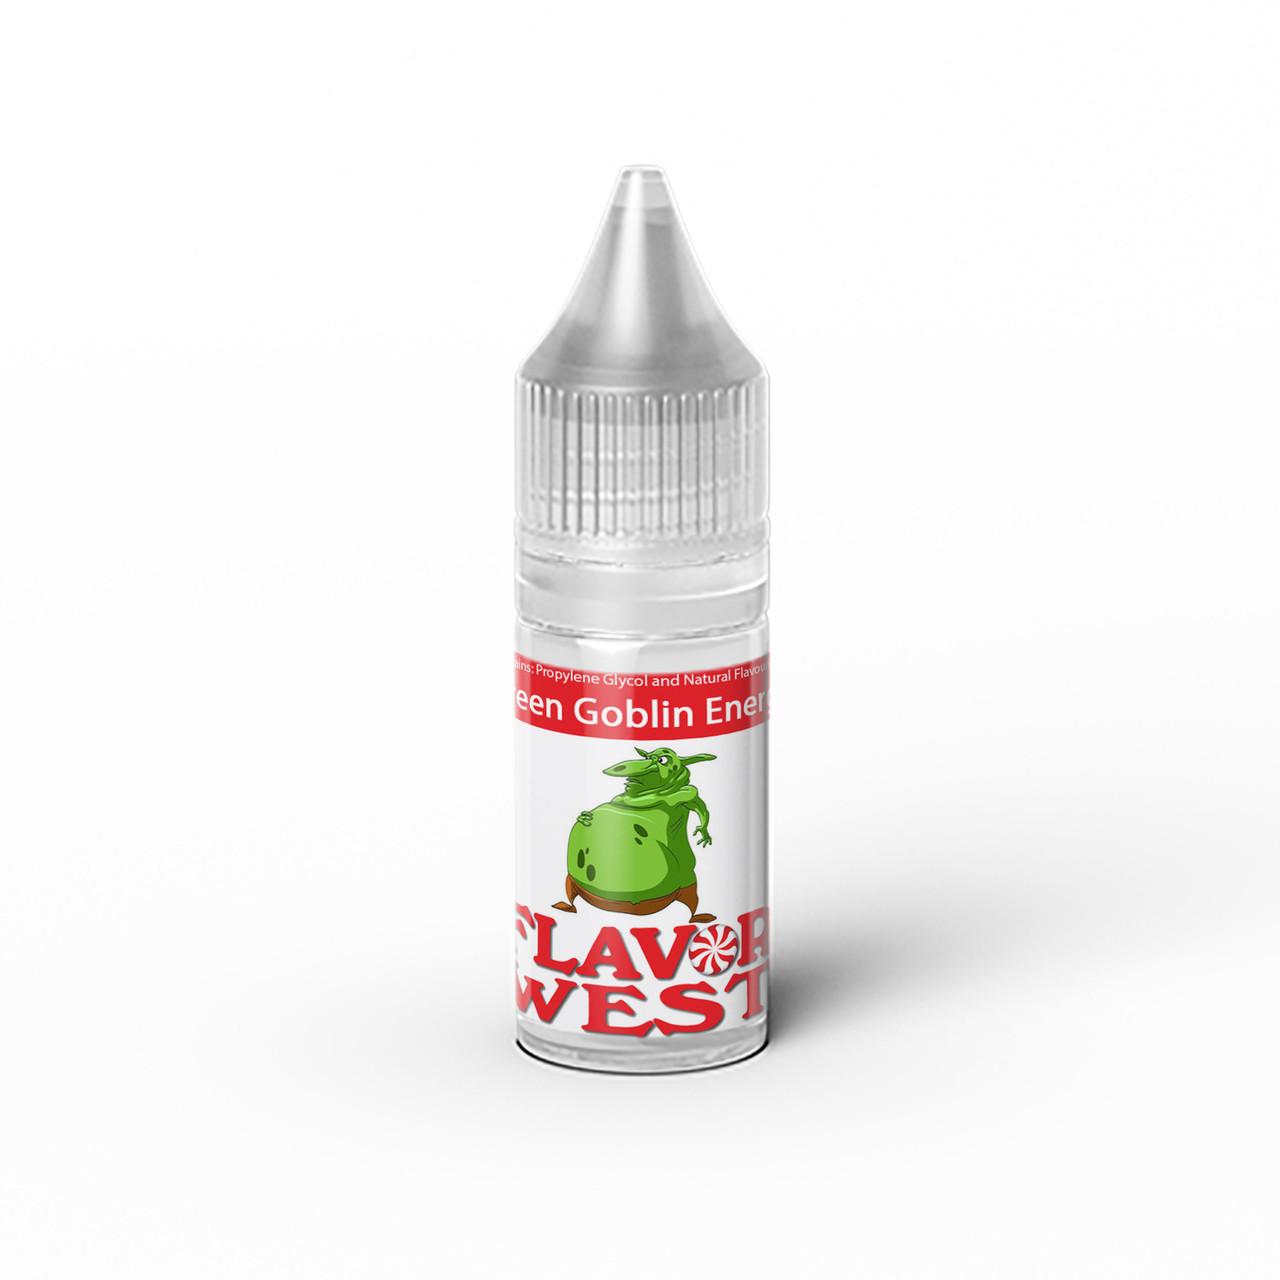 Ароматизатор FlavorWest - Green Goblin Energy (Энергия зеленого гоблина), 10 мл.